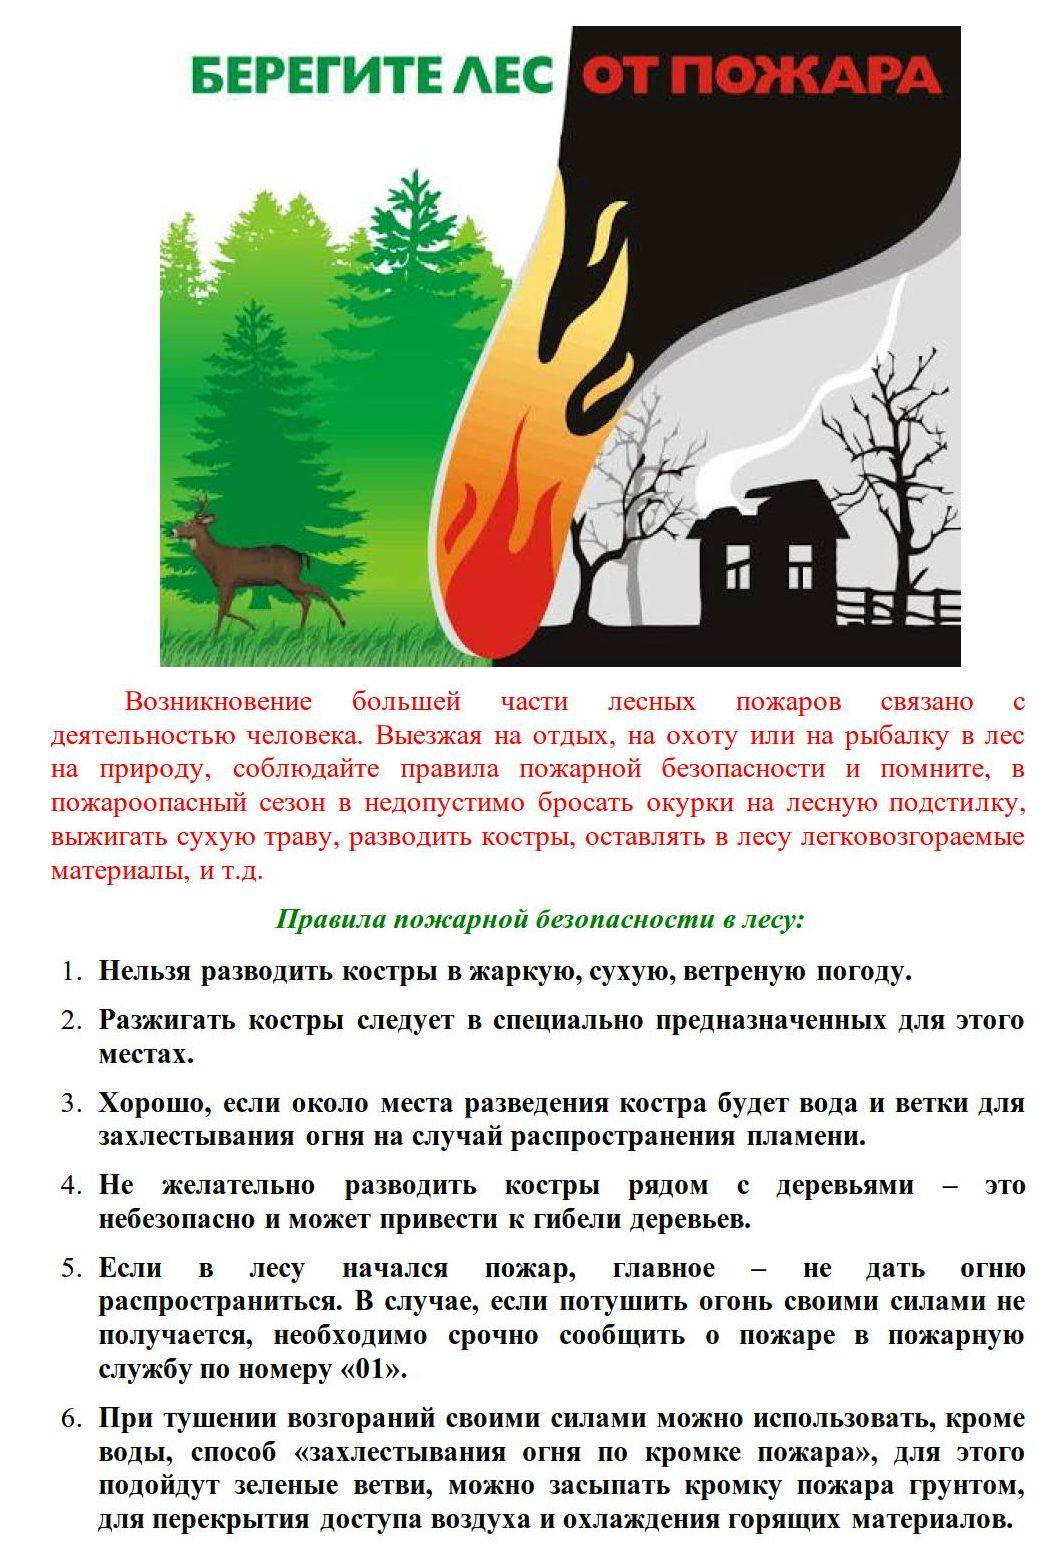 Берегите лес от пожара_1